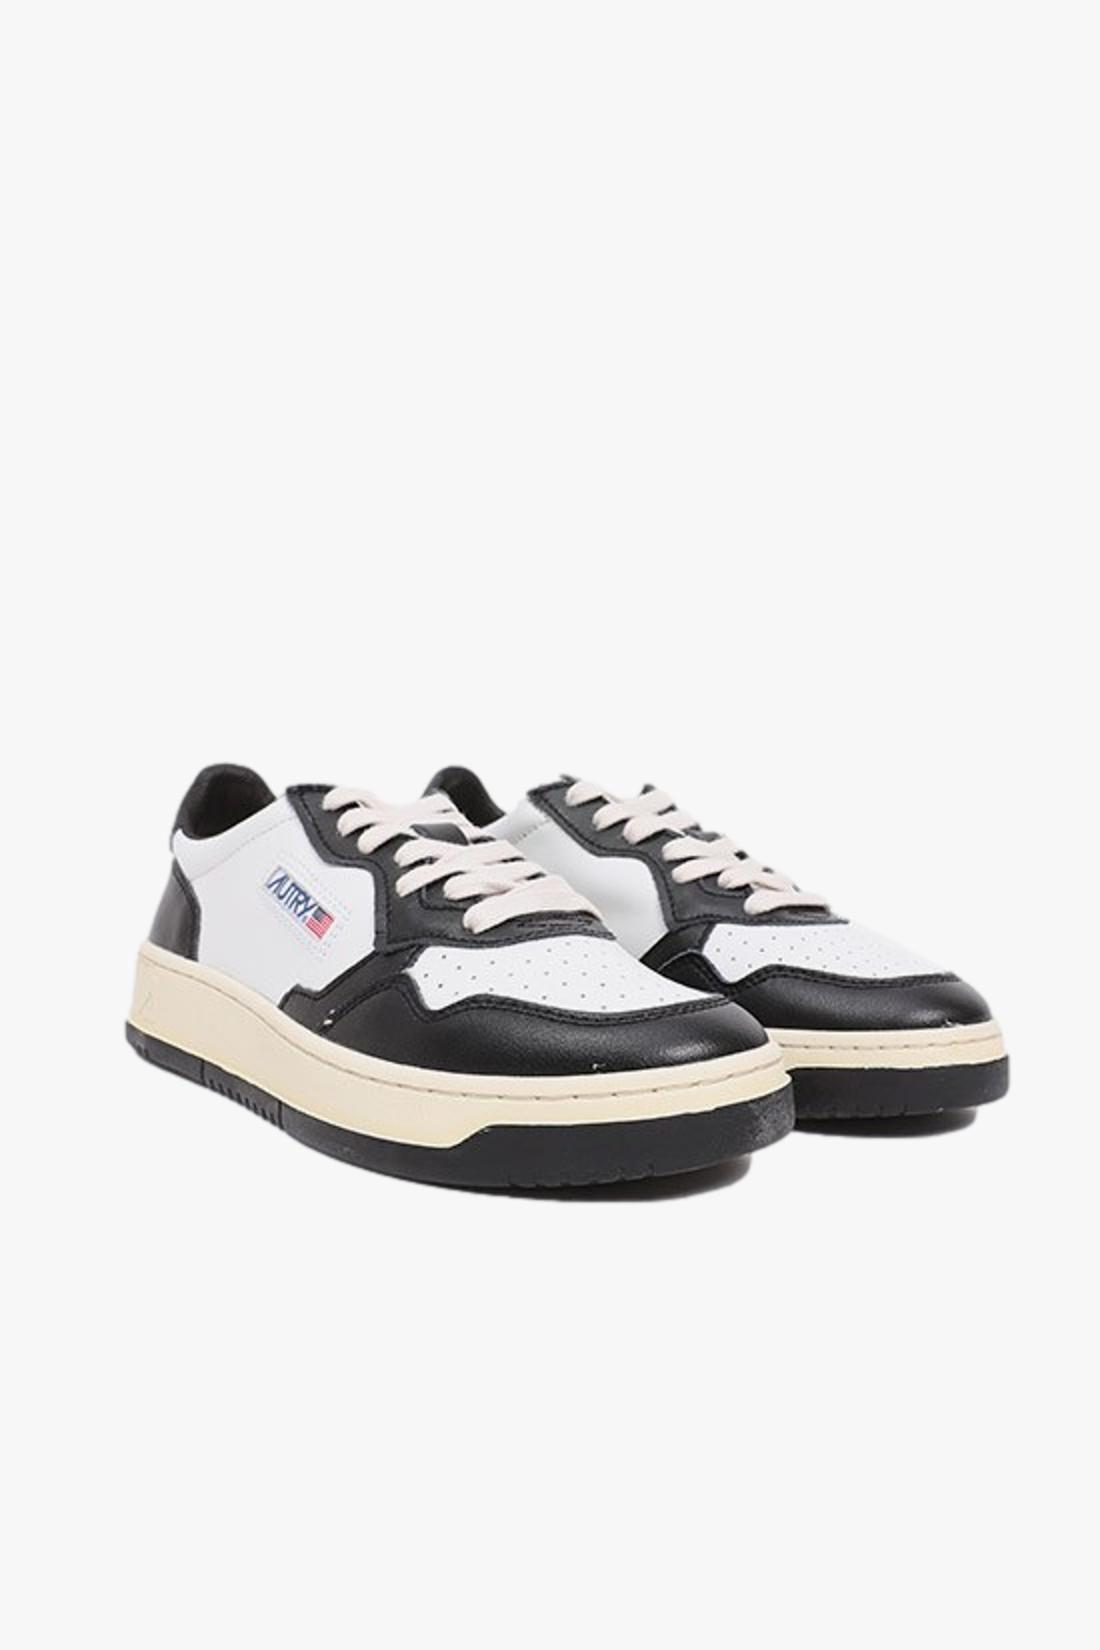 AUTRY / Autry wb01 bicolore White/black